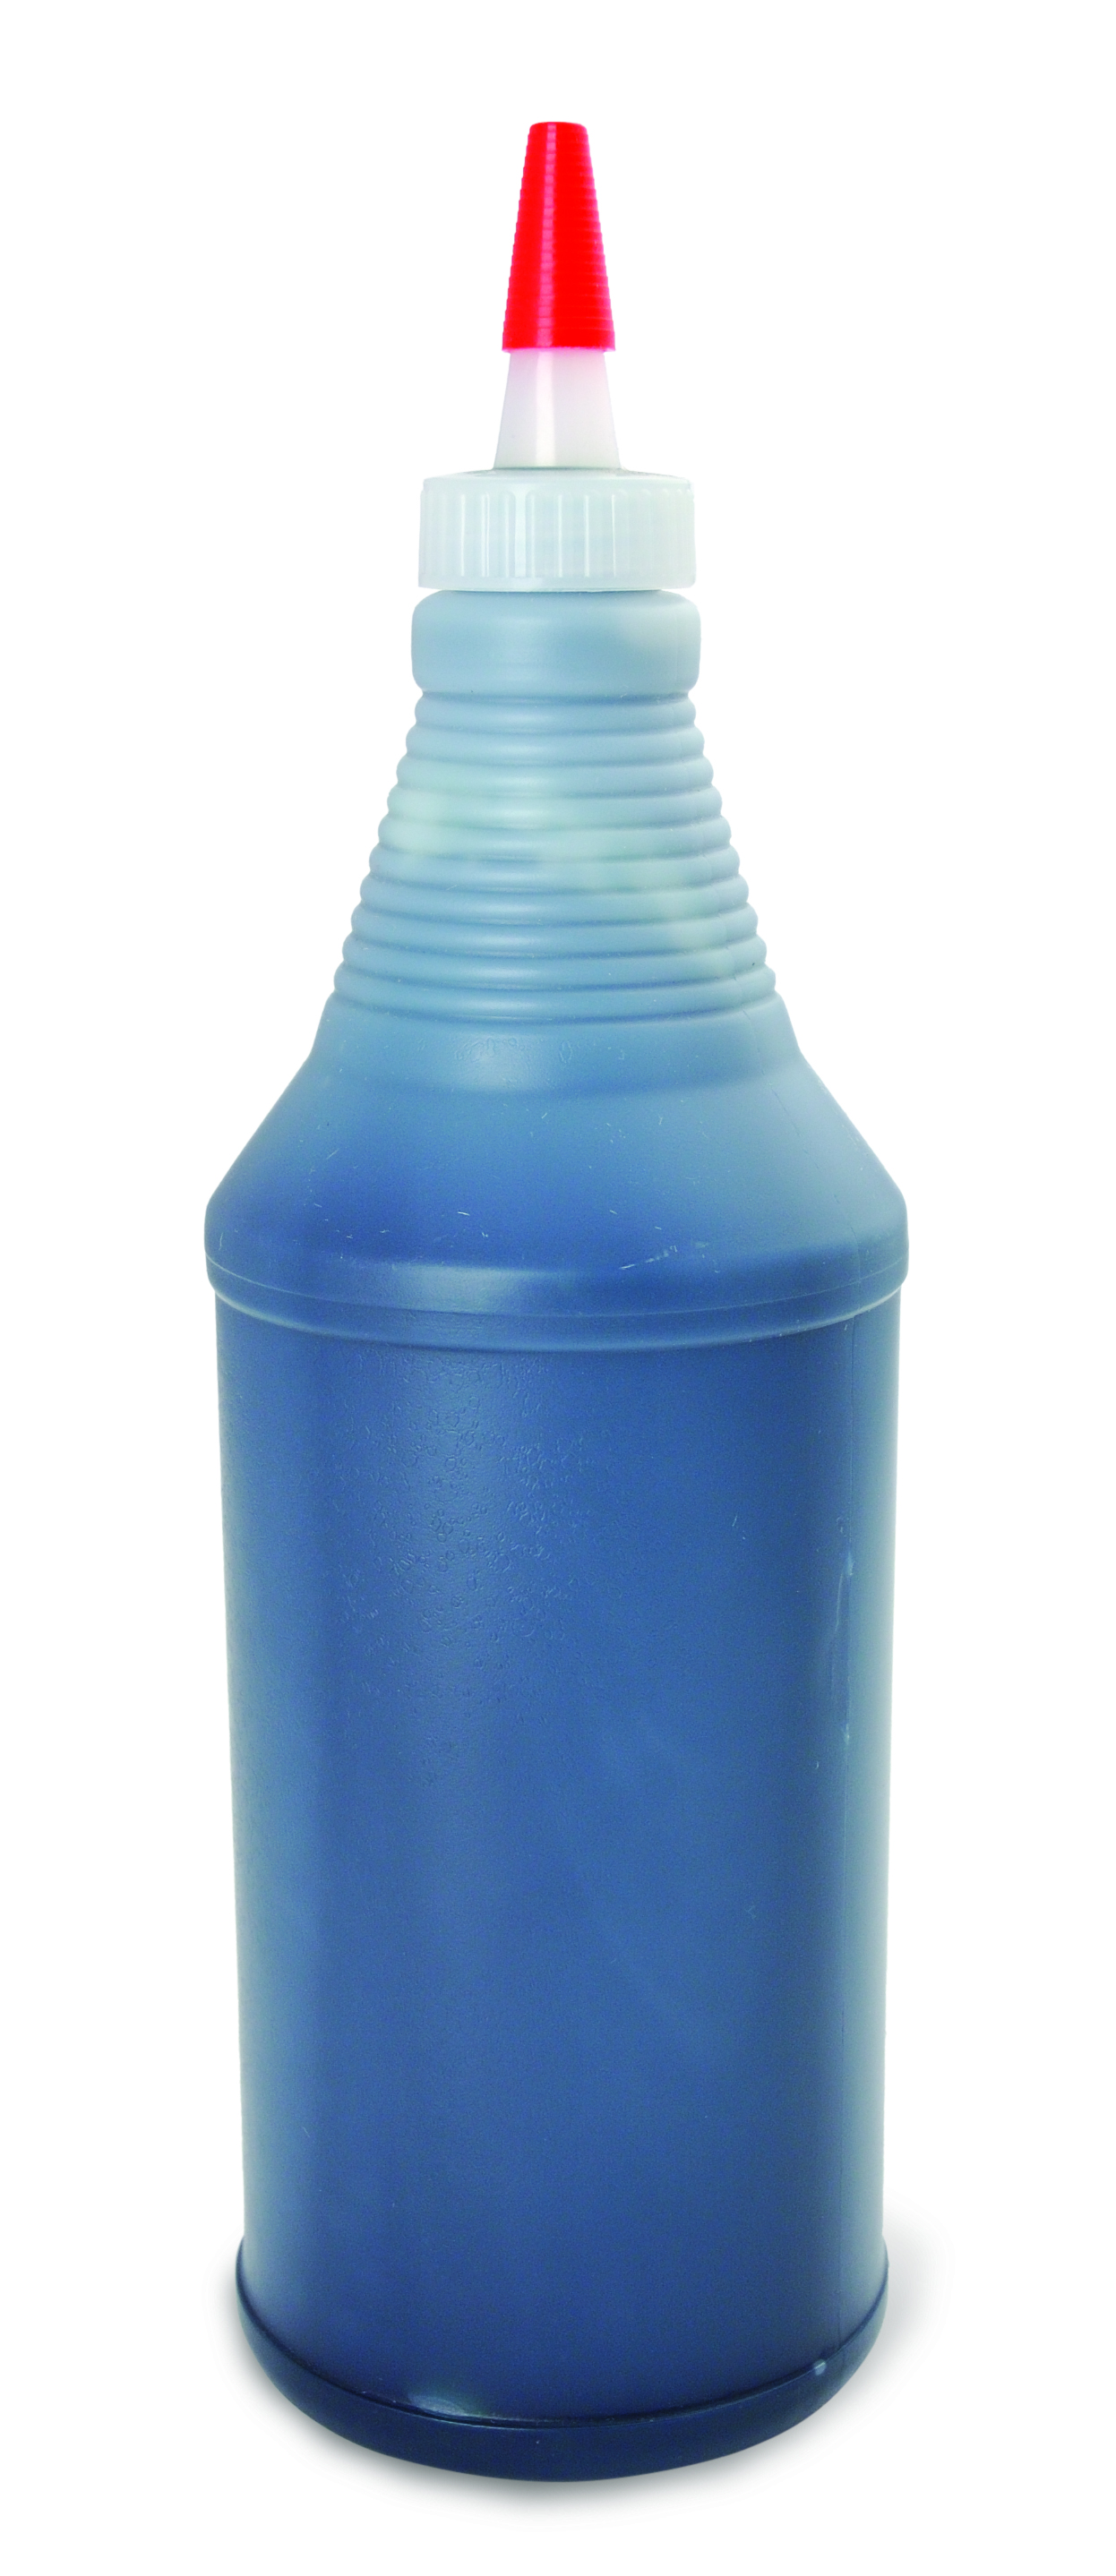 Quot 00 Quot Gear Lube 32 Oz Bottle For Snapper 11050